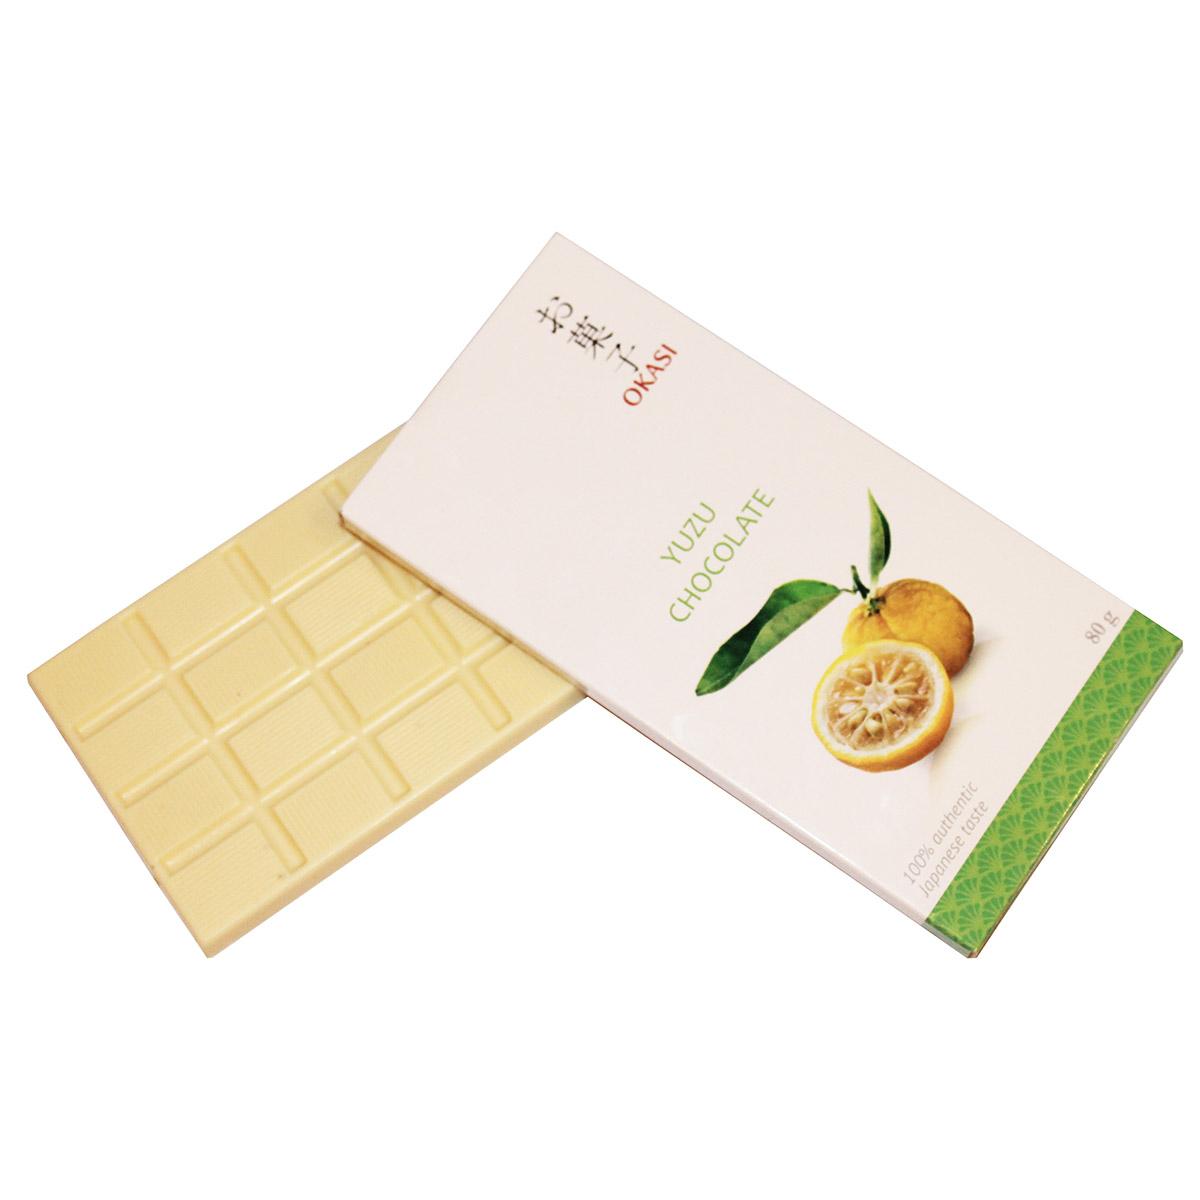 Шоколад Okasi с юдзу, плитка, 80 г цена